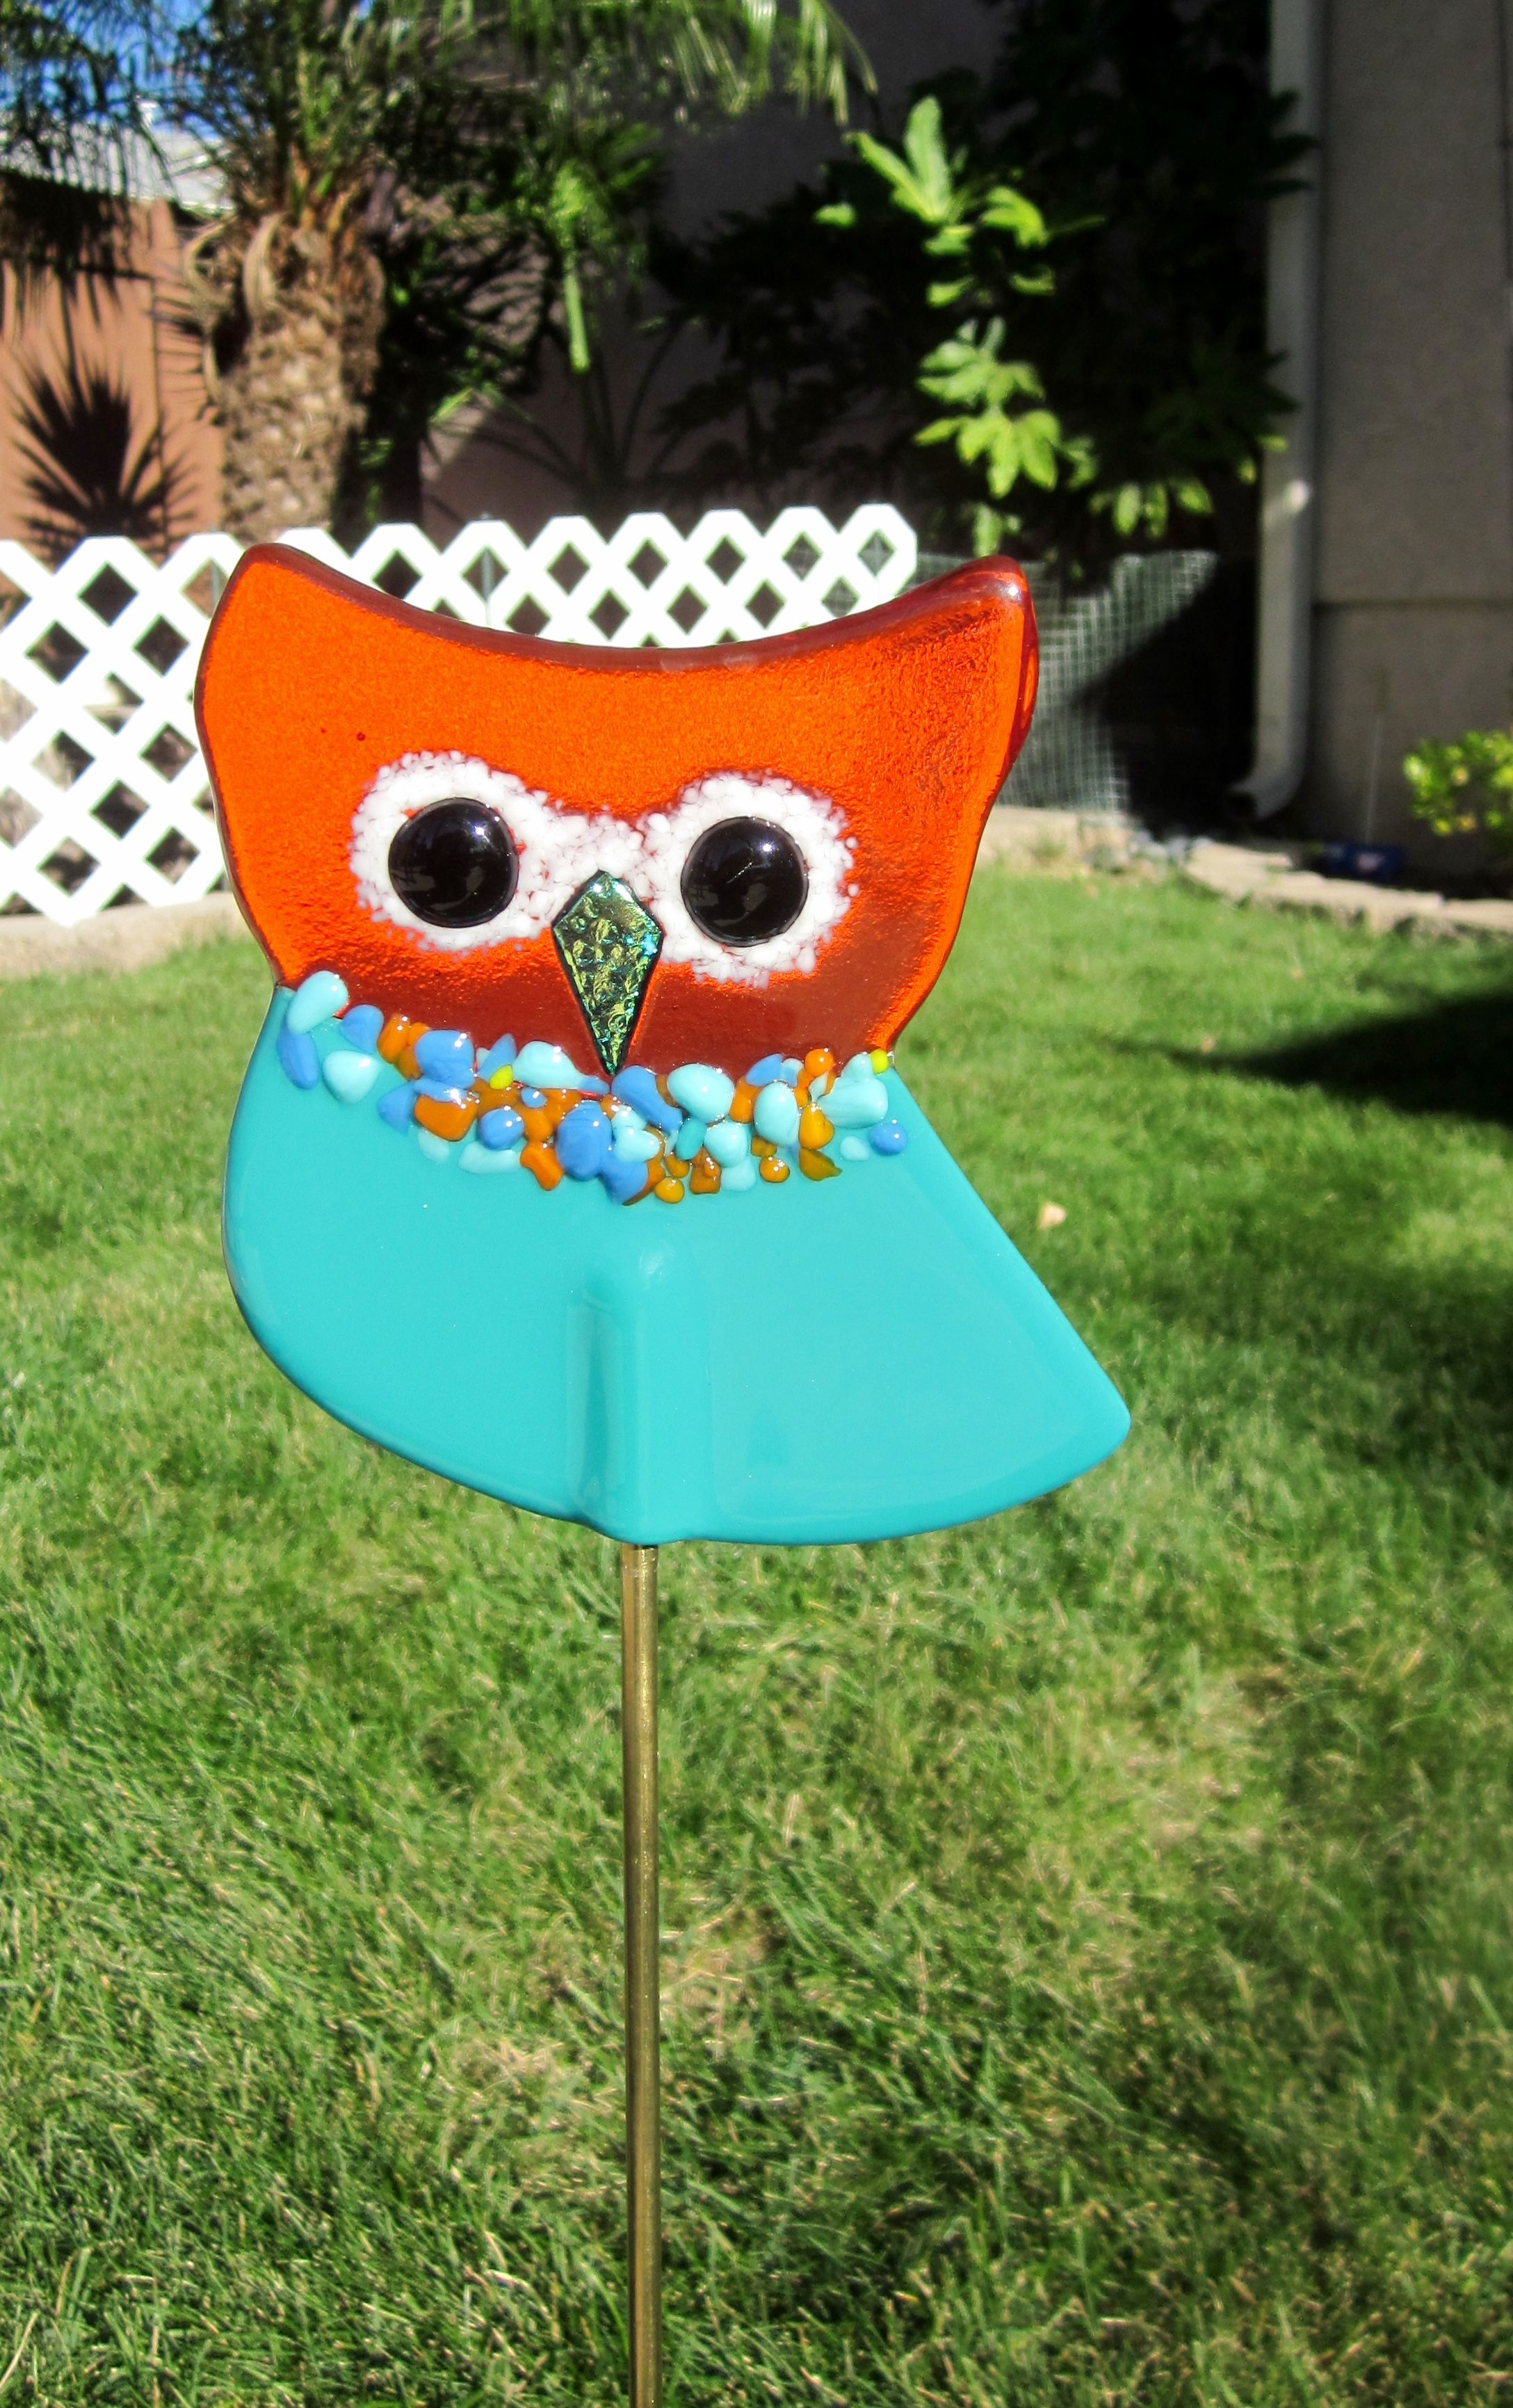 Fused Glass Orange And Teal Owl Garden Stake Www.ebay.com/usr/